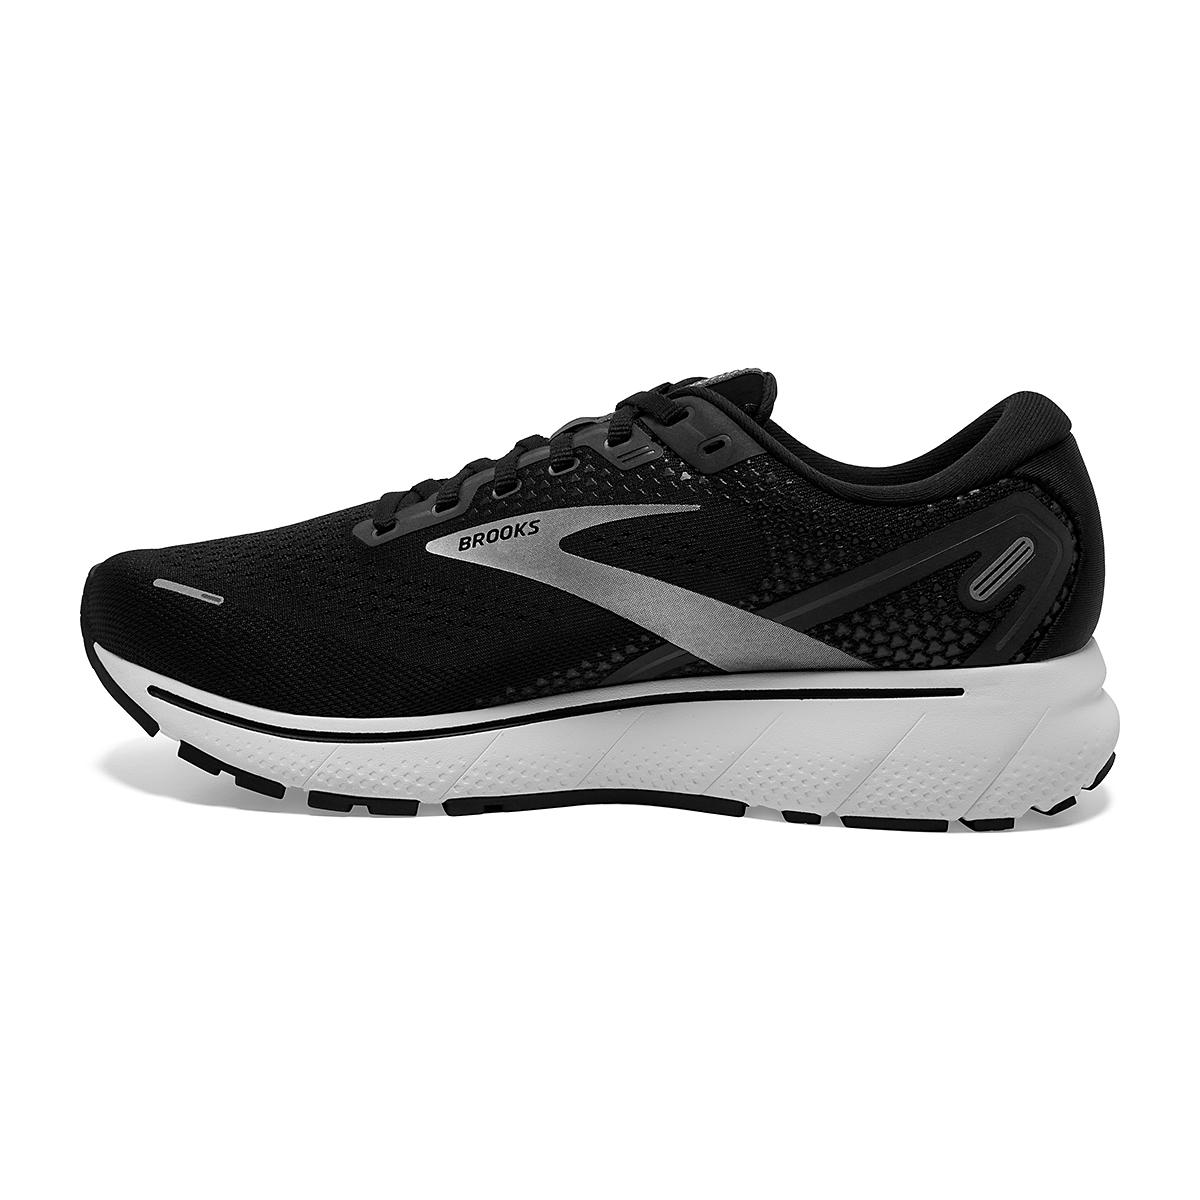 Men's Brooks Ghost 14 Running Shoe - Color: Black/White - Size: 7 - Width: Regular, Black/White, large, image 4